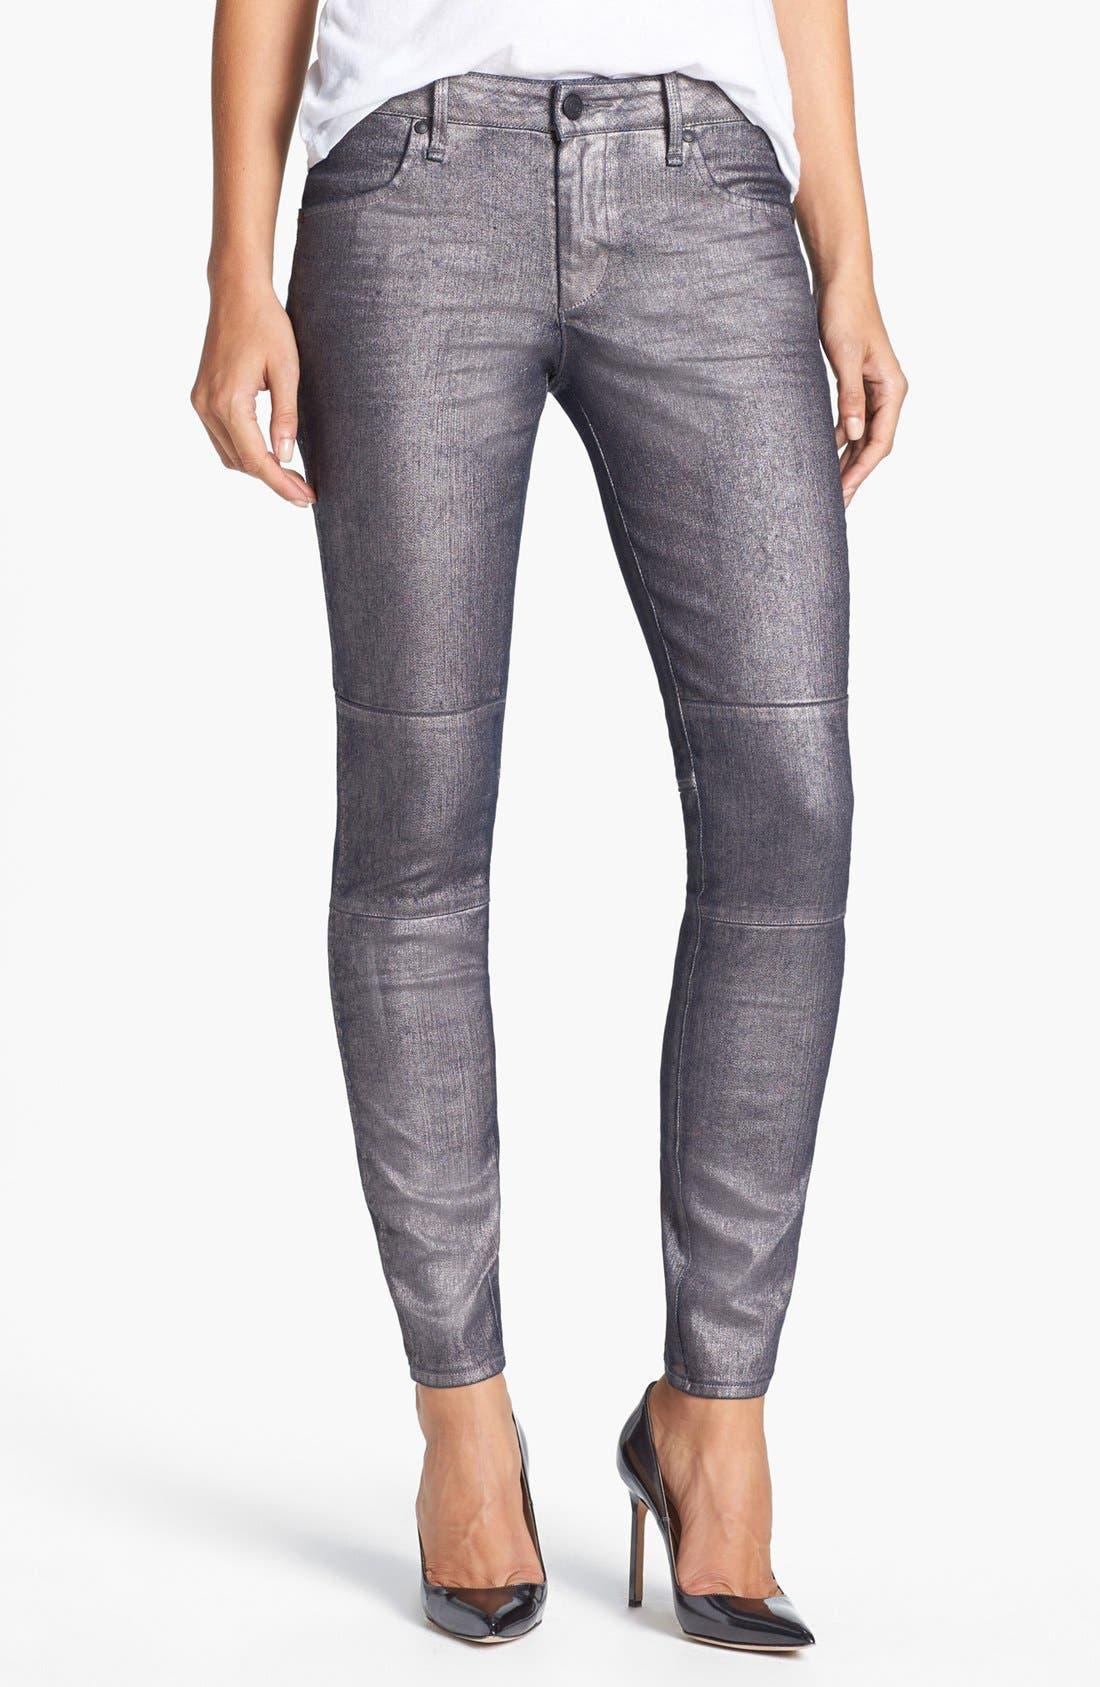 Alternate Image 1 Selected - MARC BY MARC JACOBS Seamed Cigarette Leg Jeans (Gunmetal)